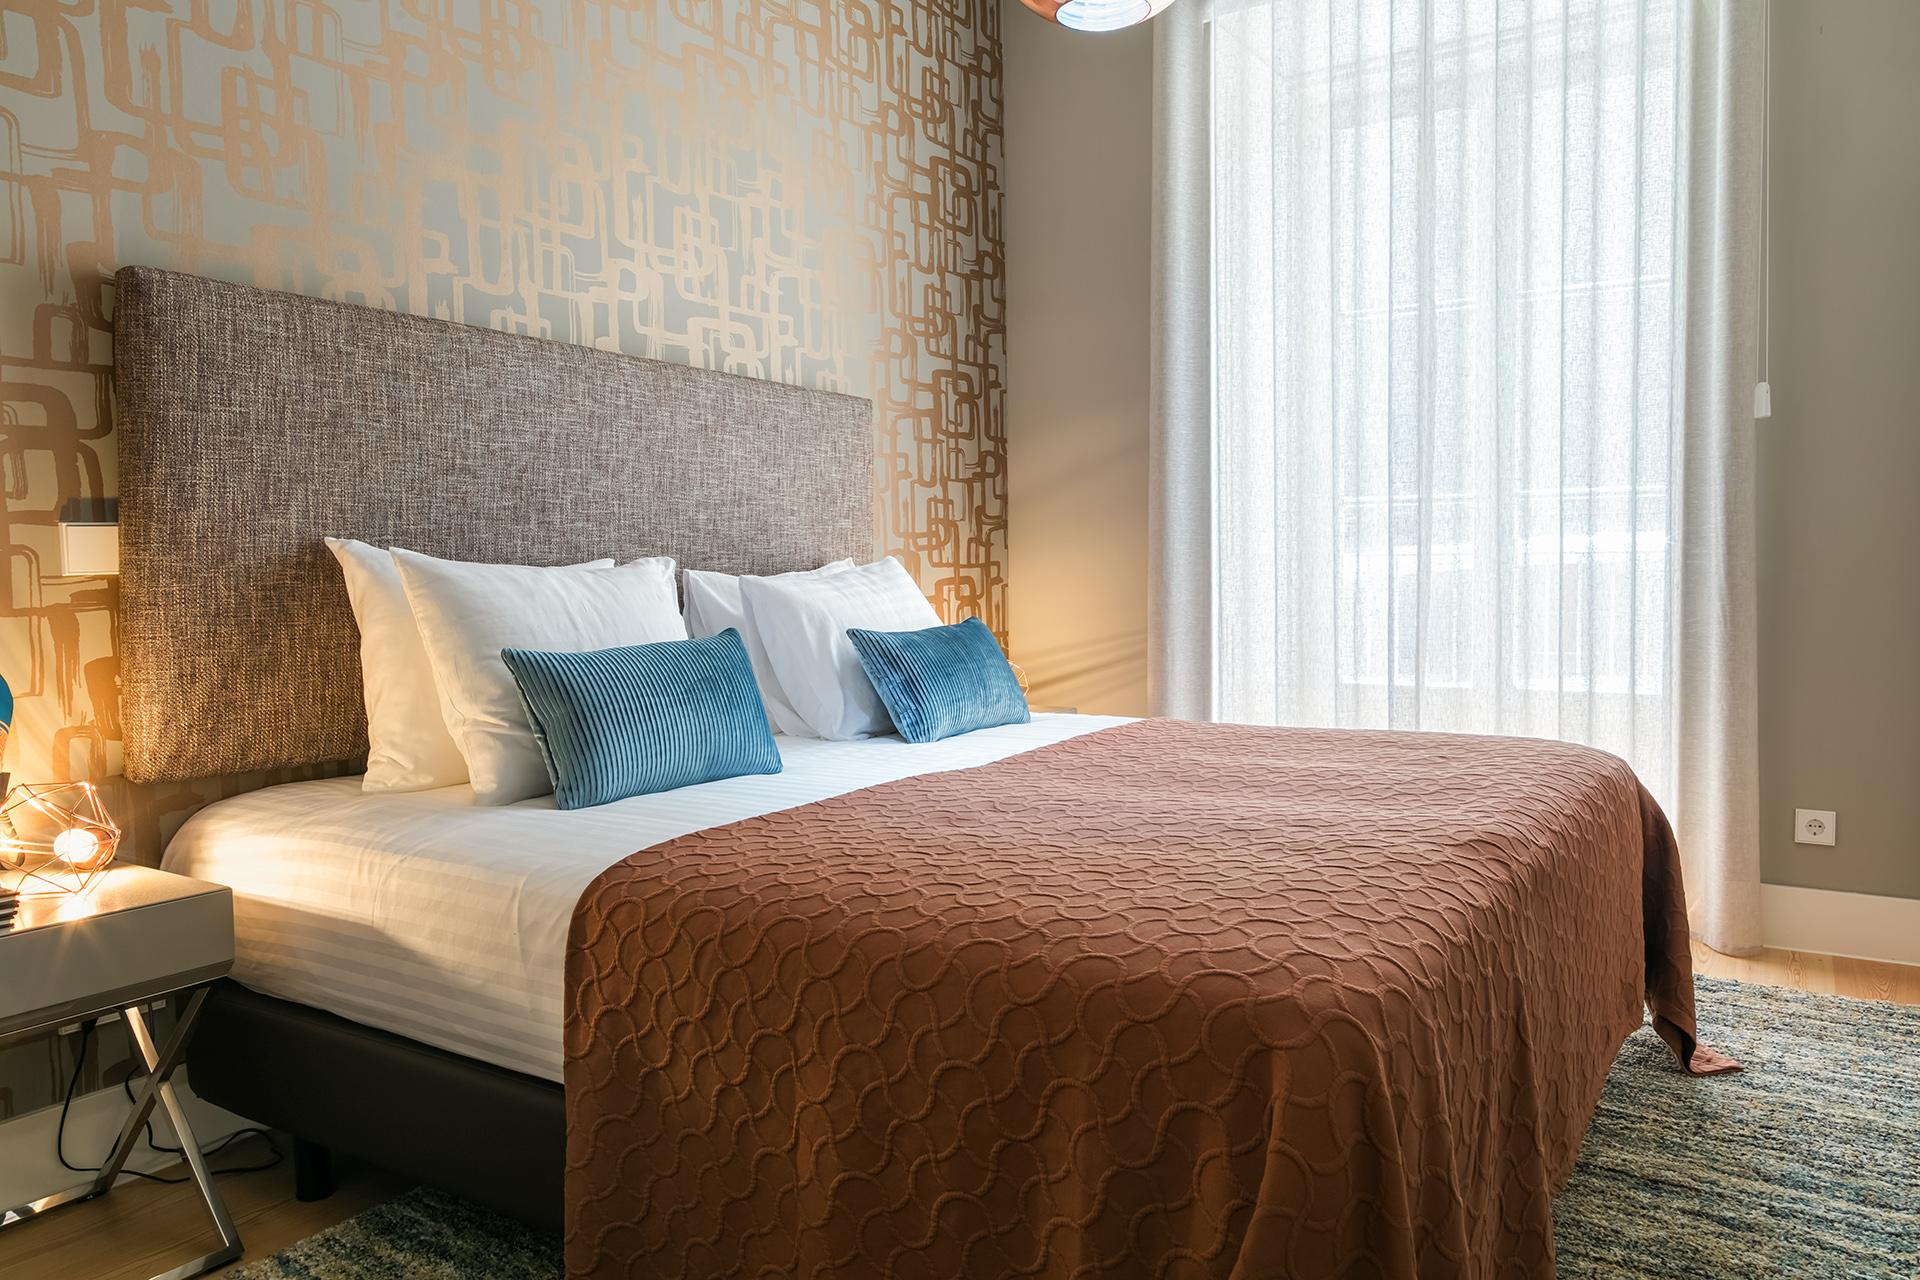 POOL APARTMENT CENTER LISBON - Luxe Apartments Rentals